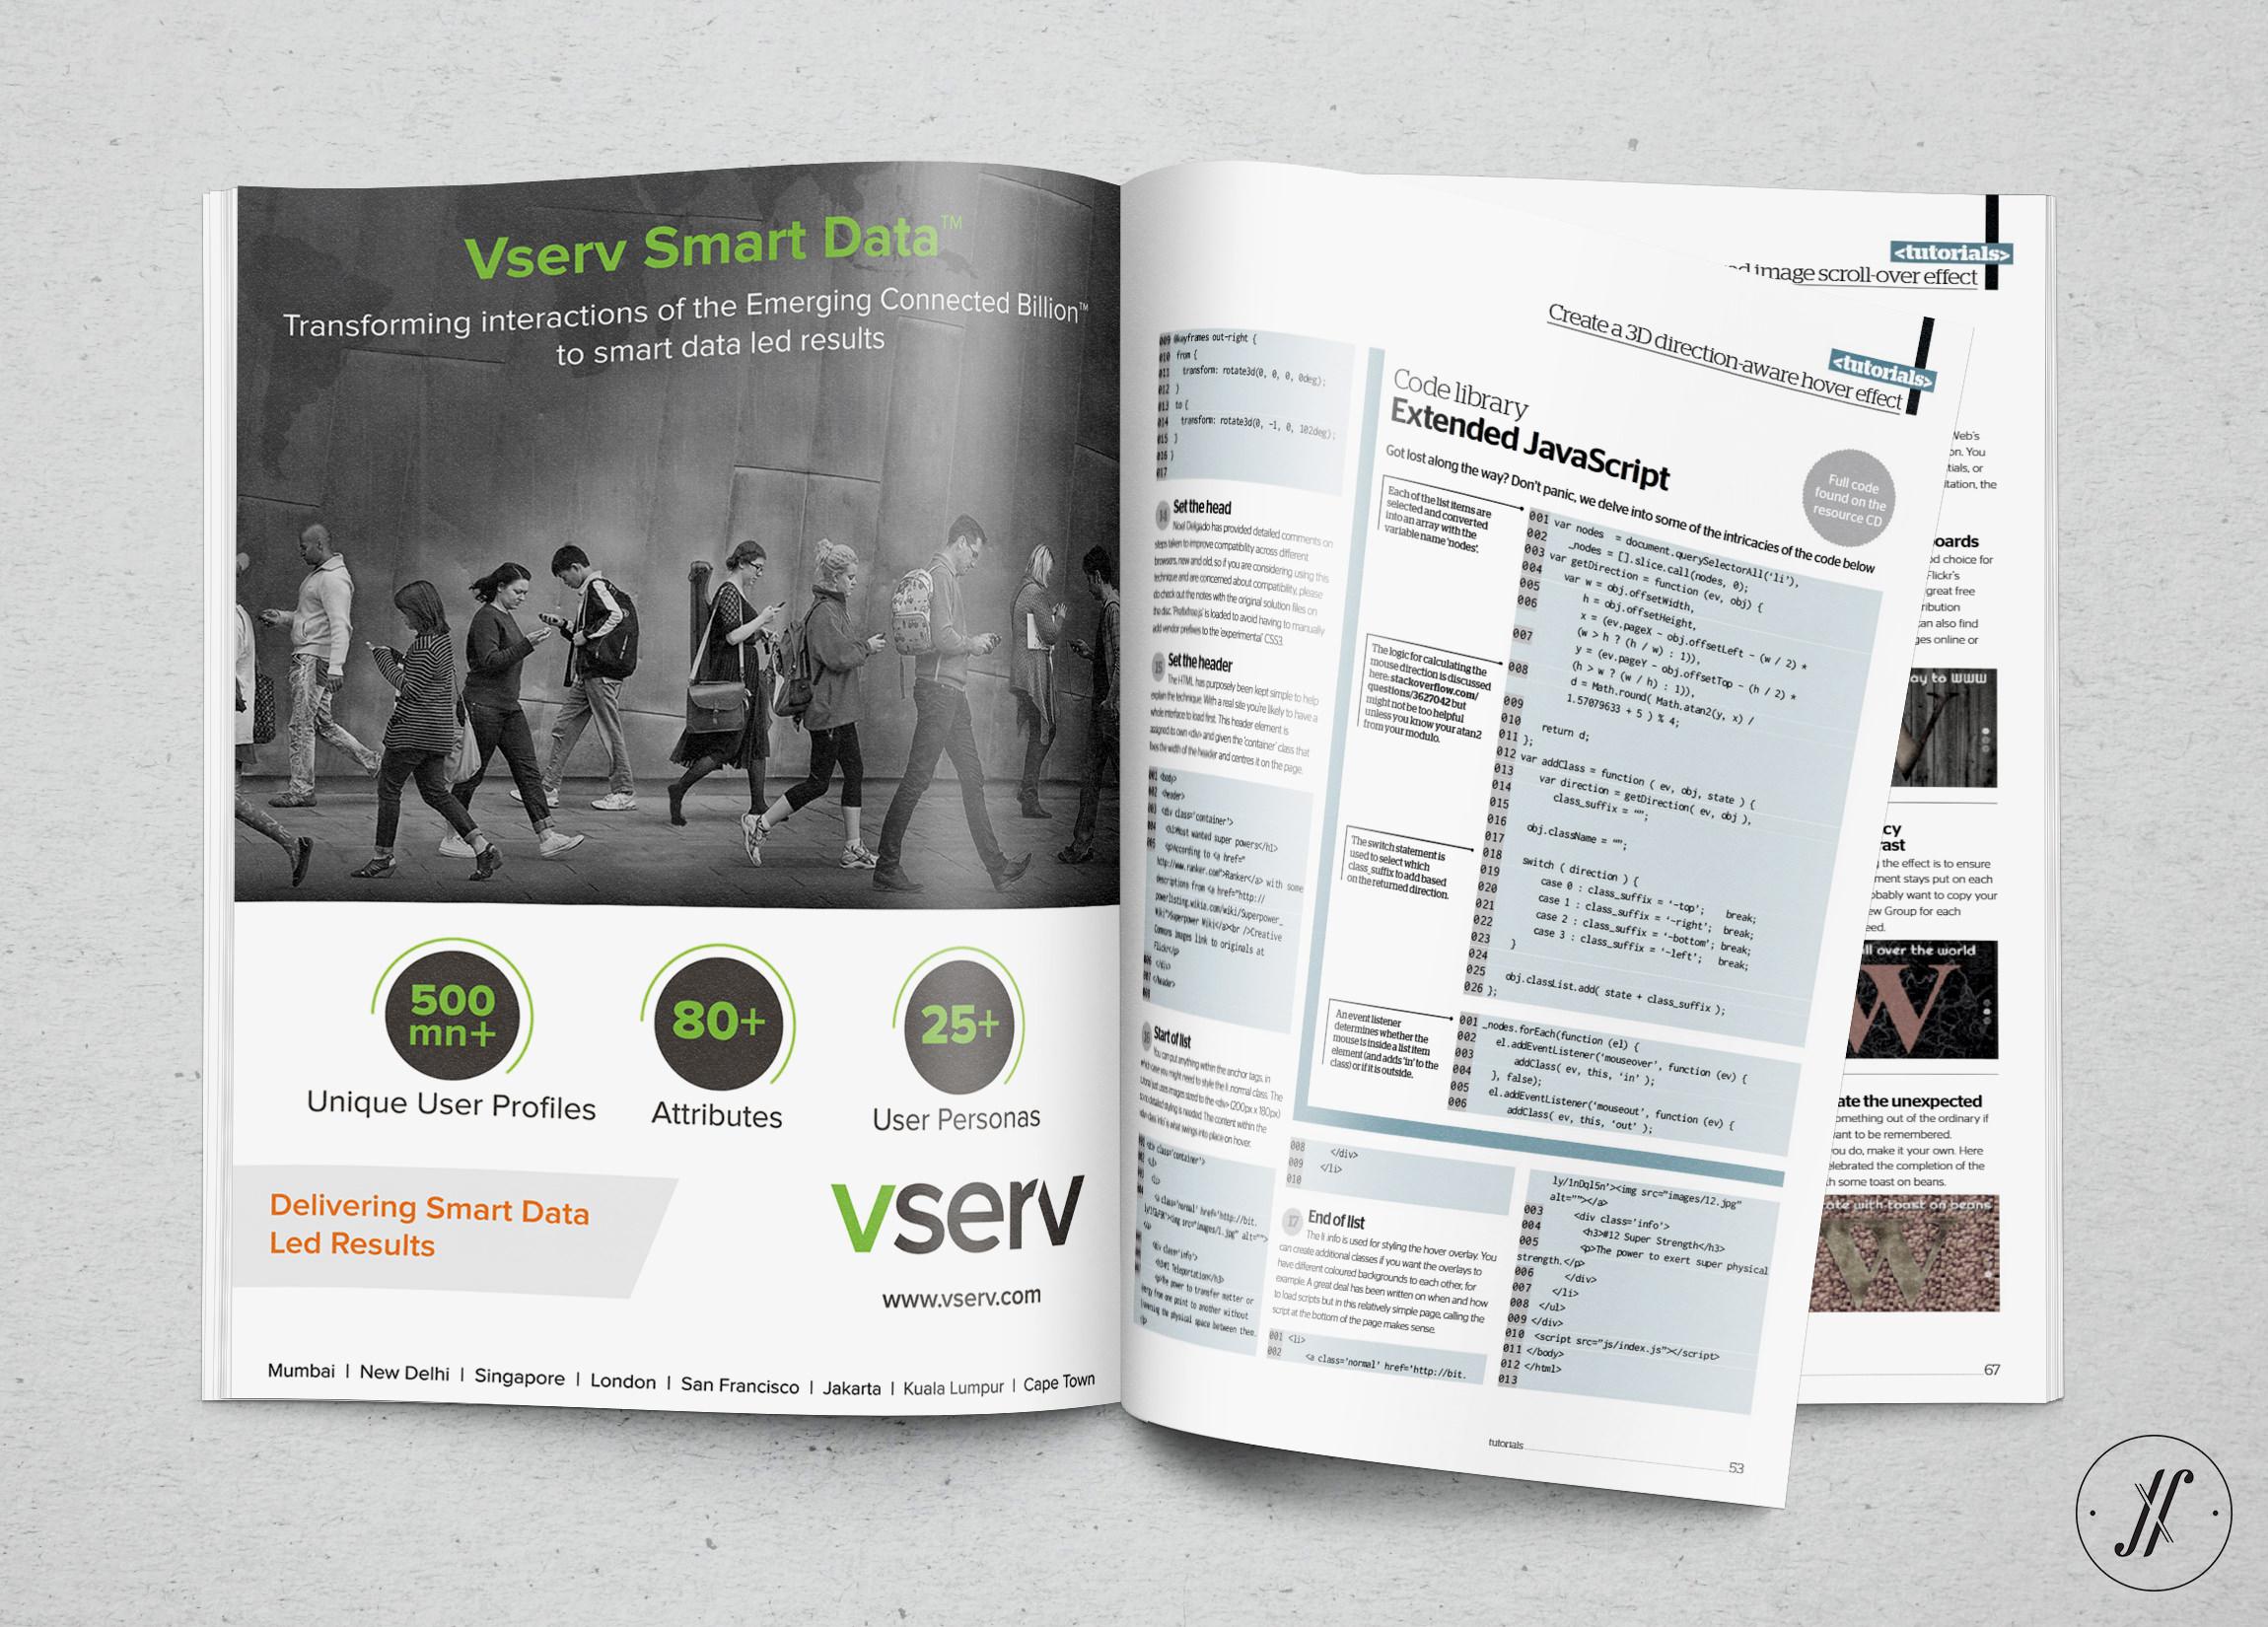 Yellow-Fishes-branding-agency-in-mumbai-and singapore-Vserv-brand-identity-rejuvenation-print-ad-design